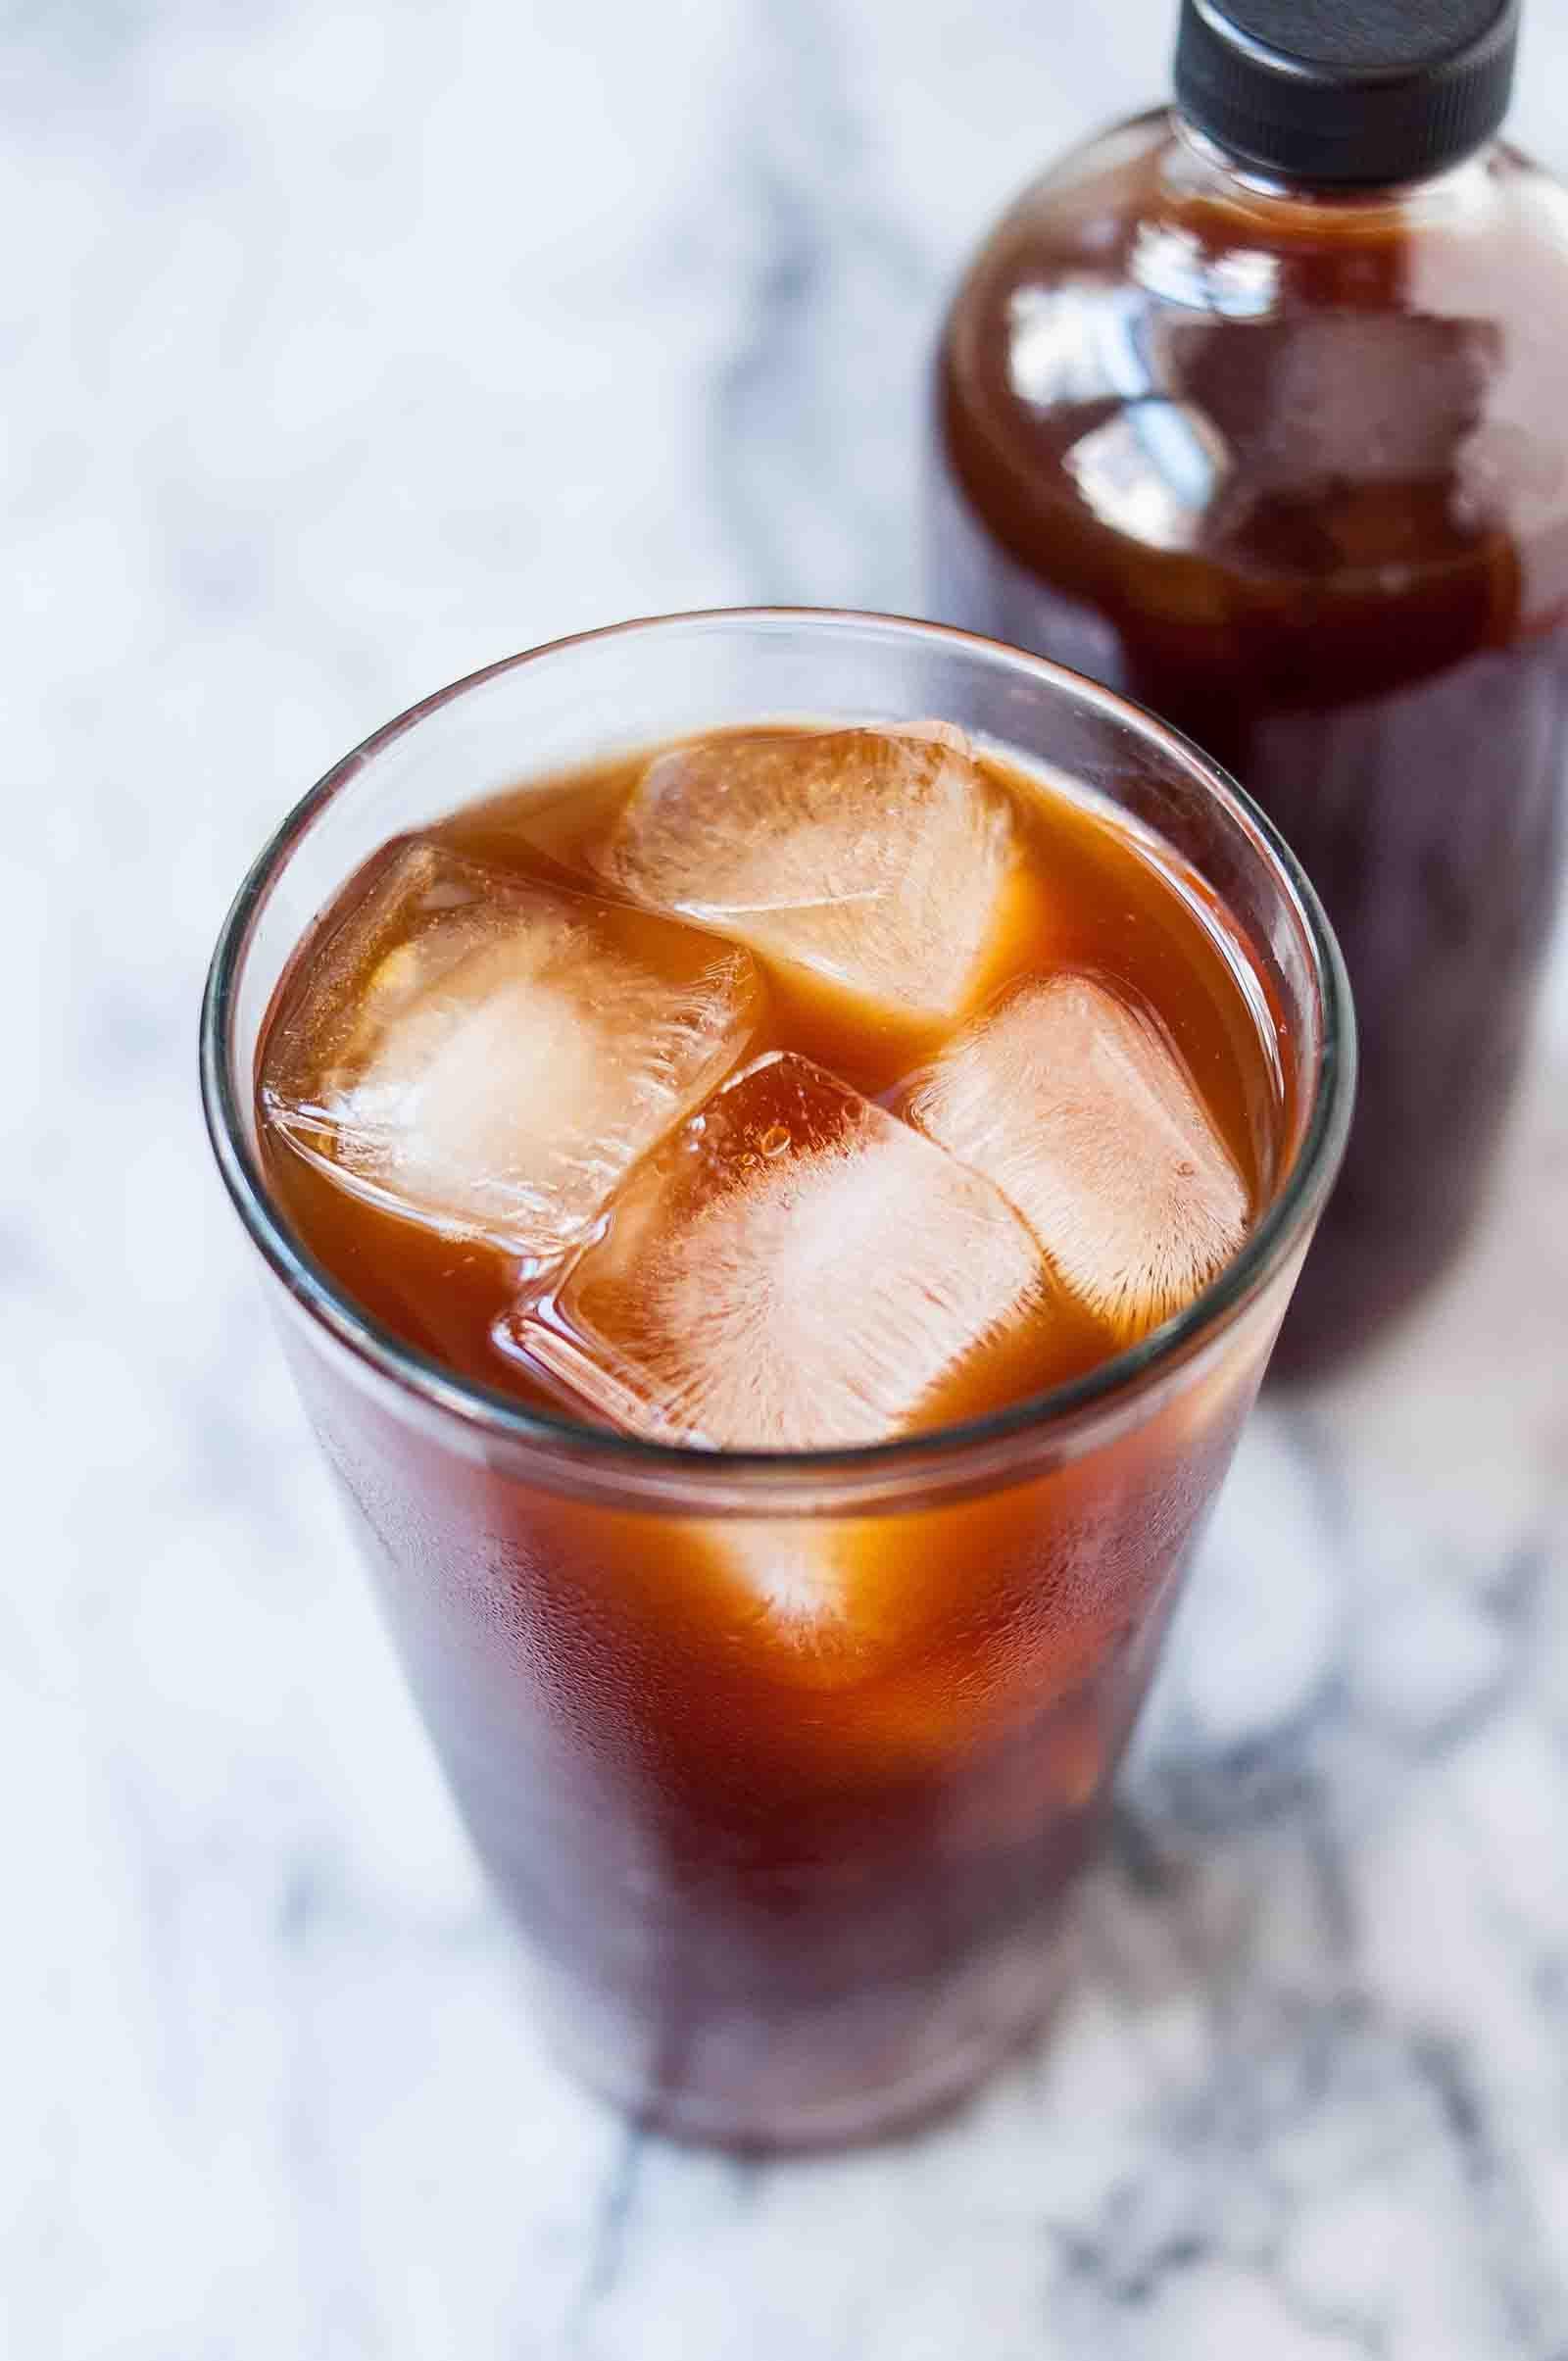 pbr coffee drink recipe